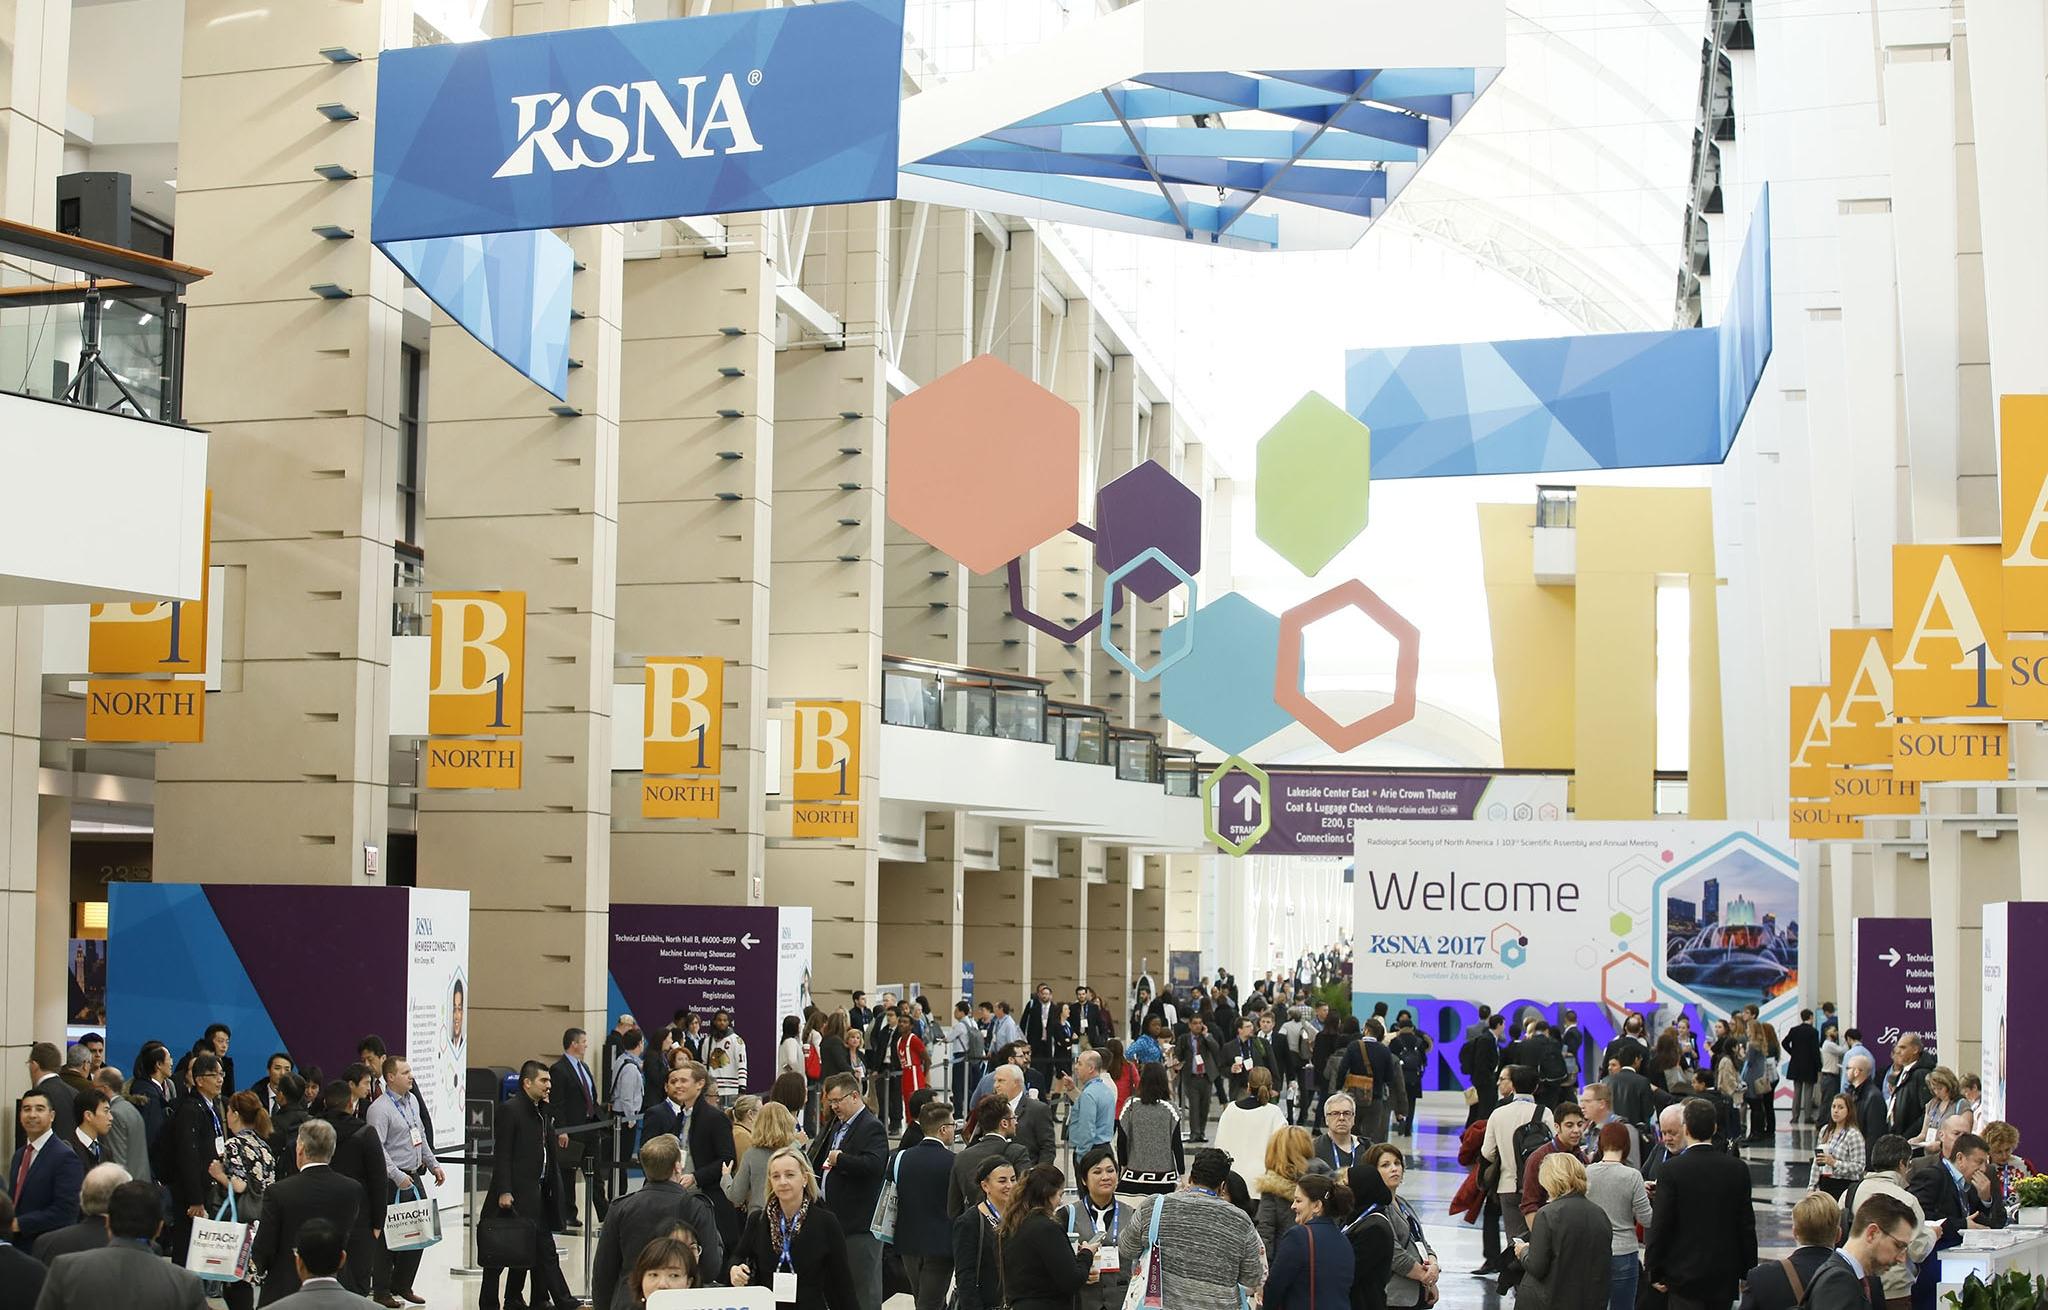 rsna_conference.jpg